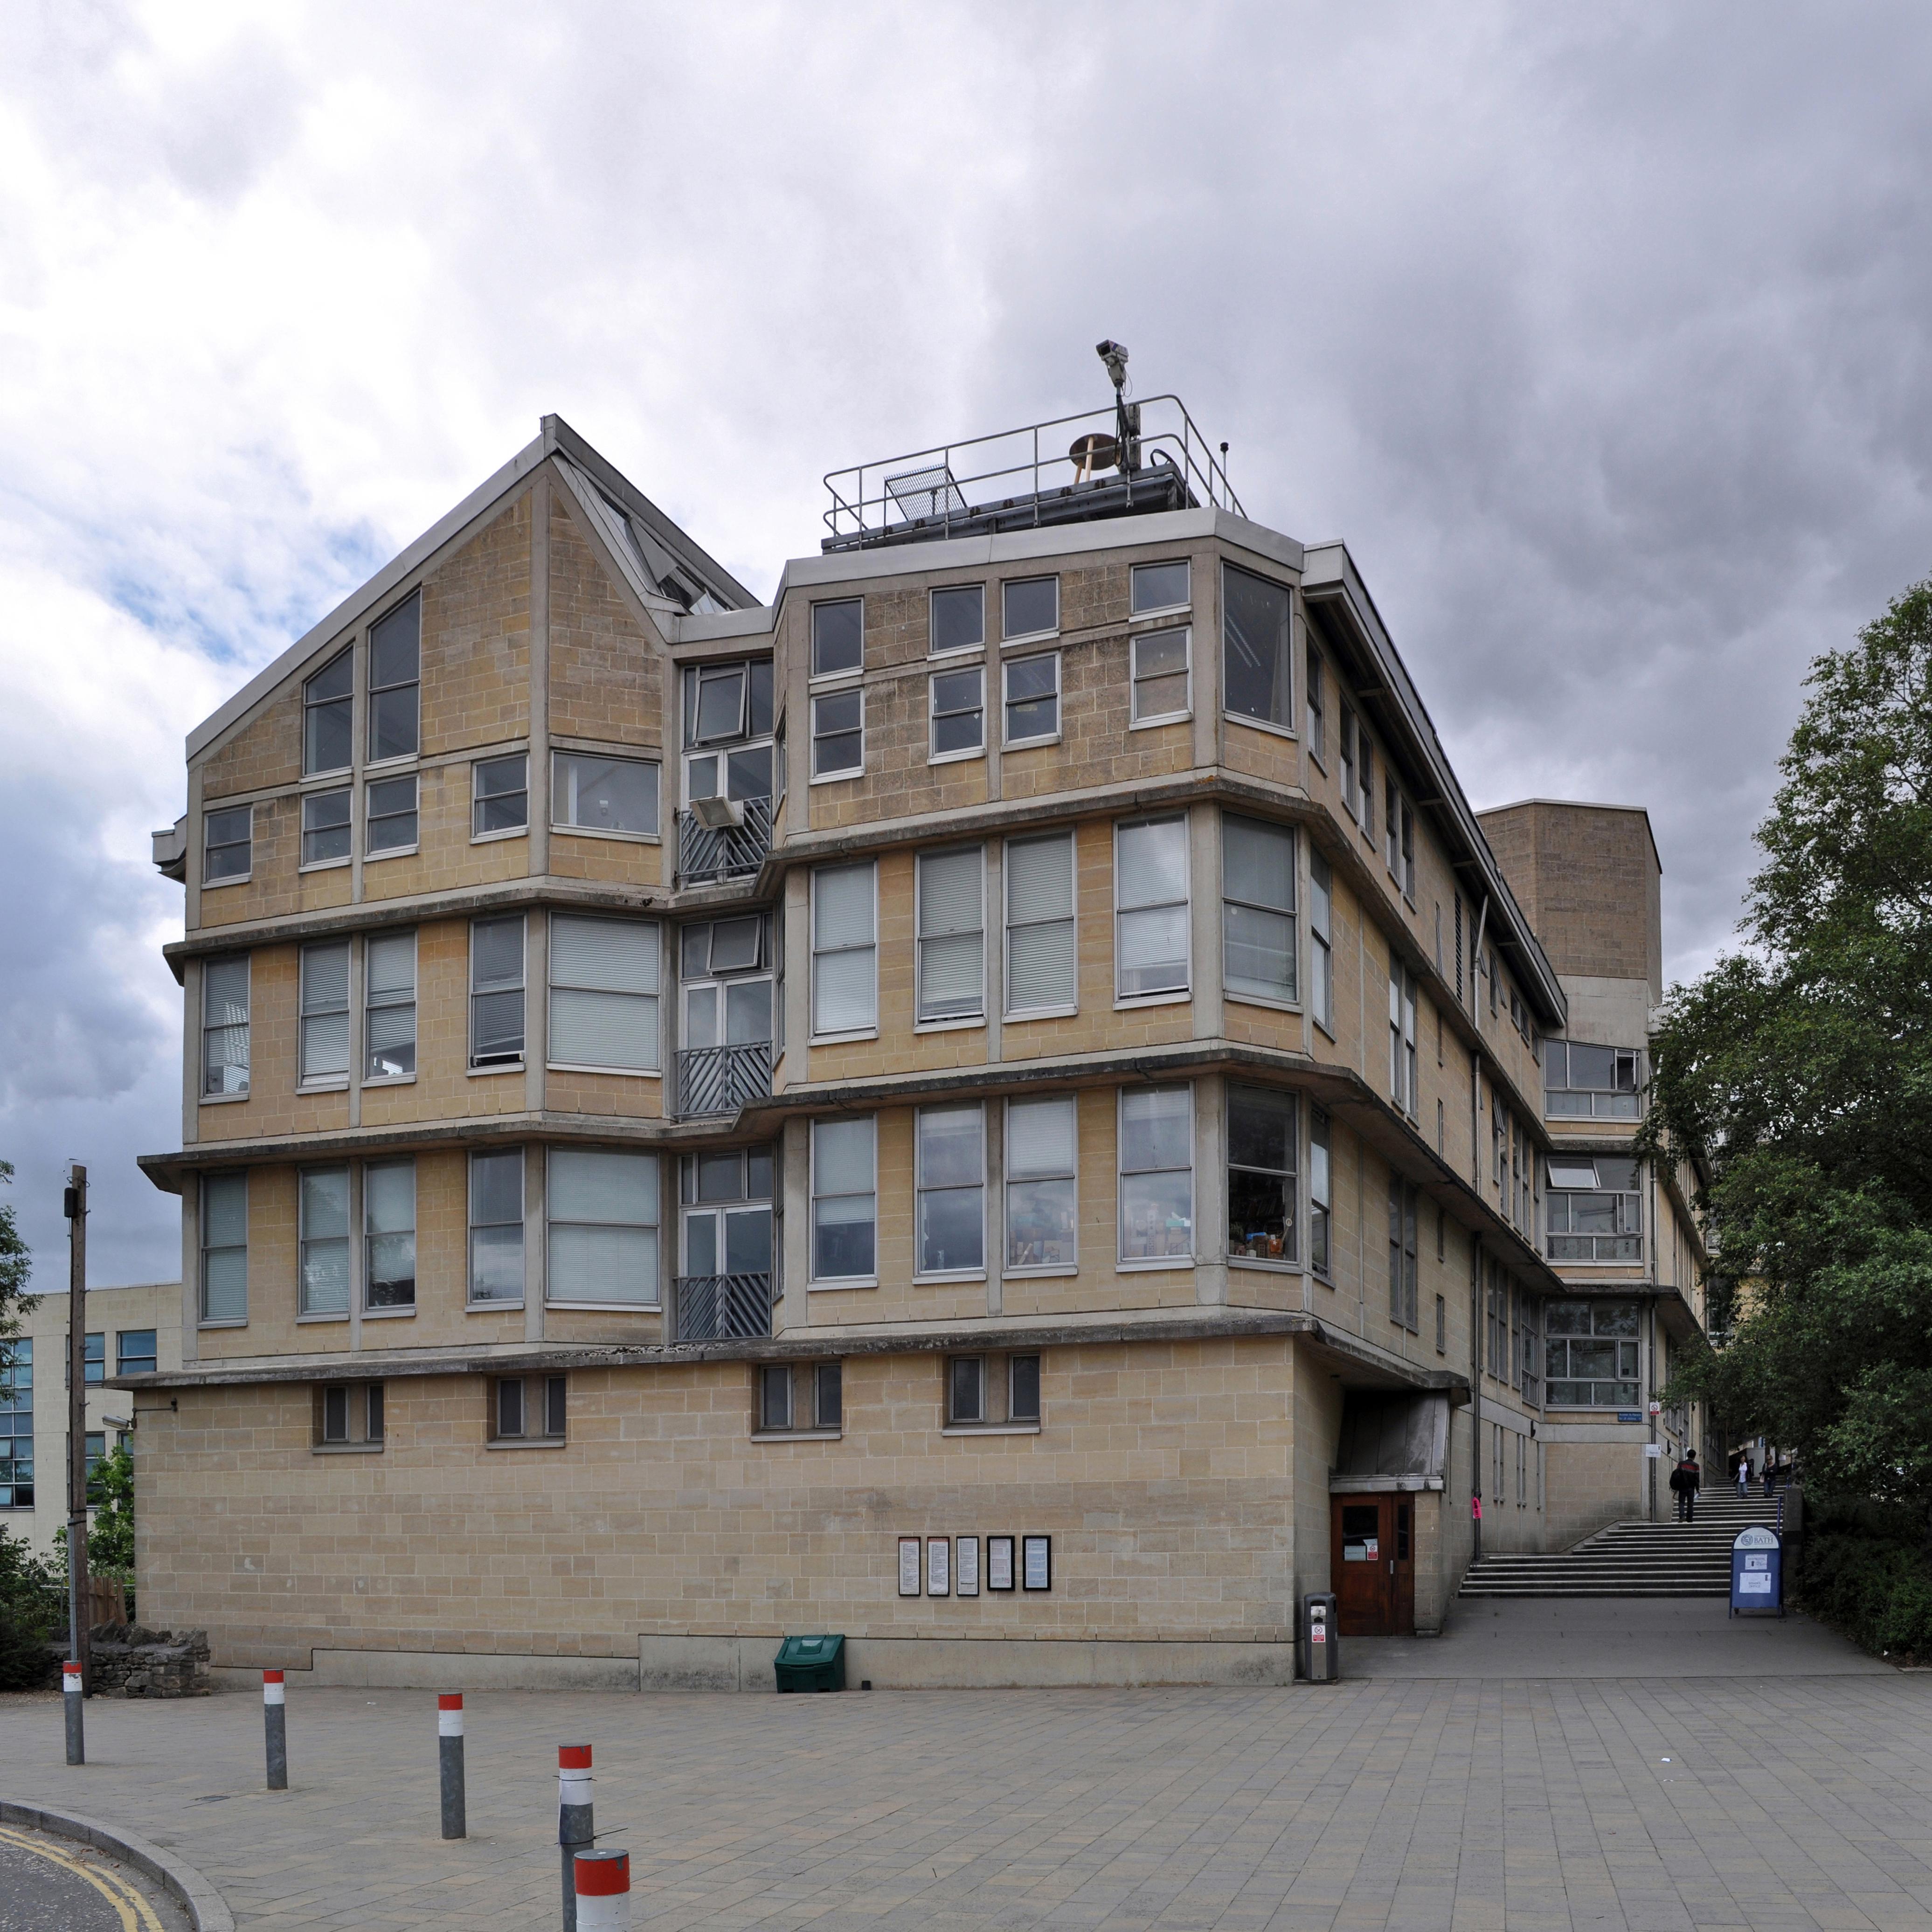 Loughborough University Architecture Building And Civil Engineering Stash